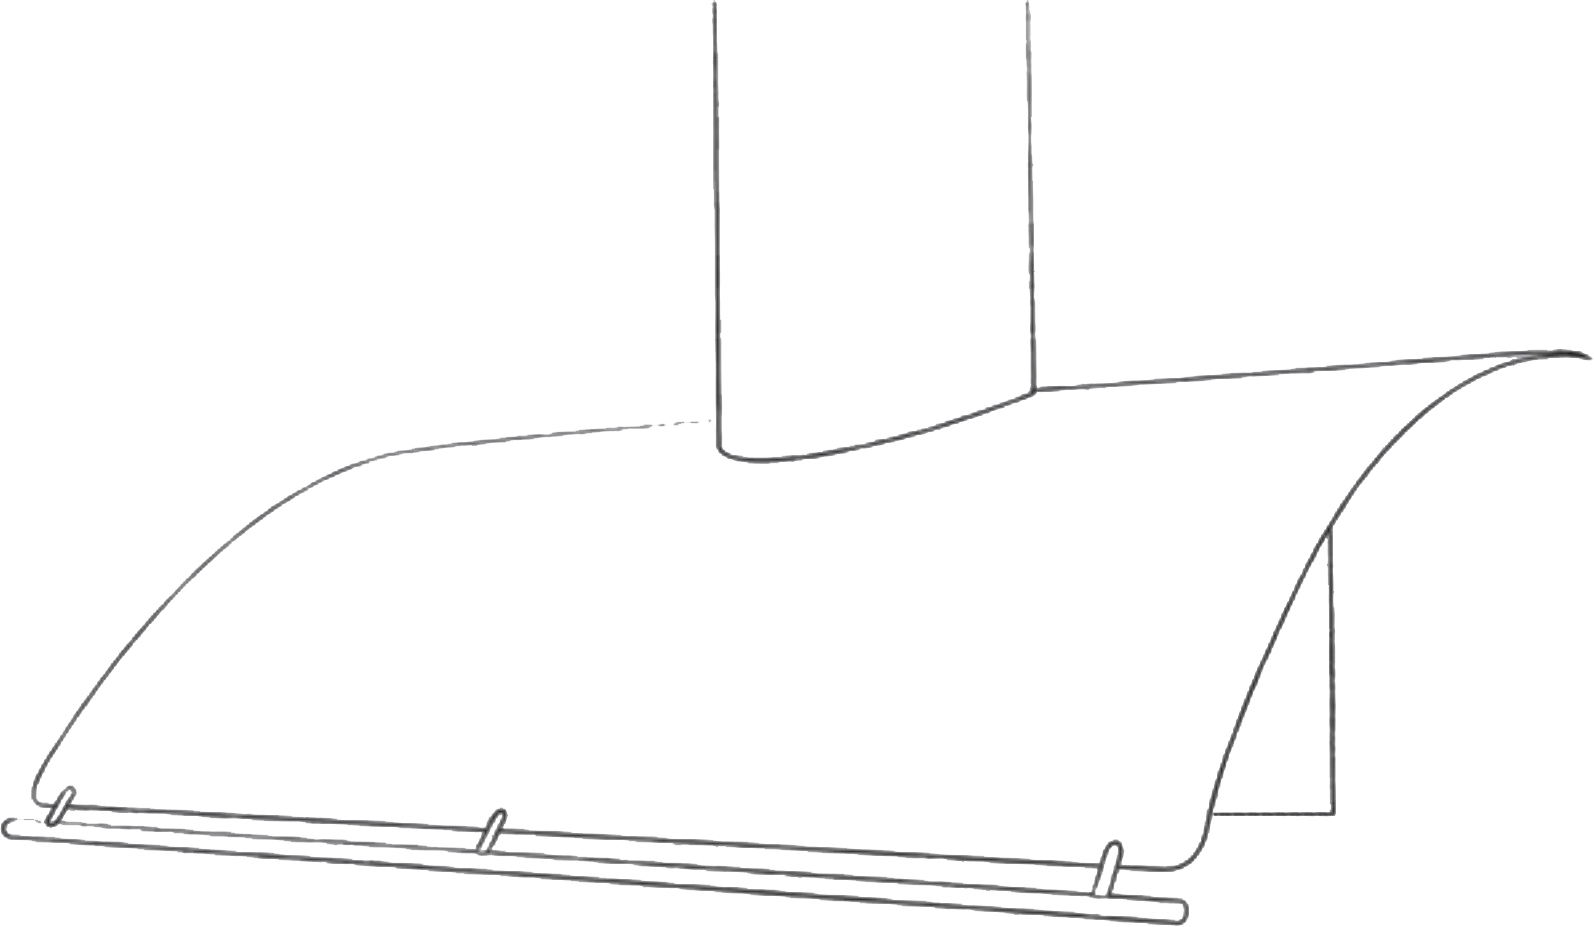 Okeanito Drawing_DK.jpg